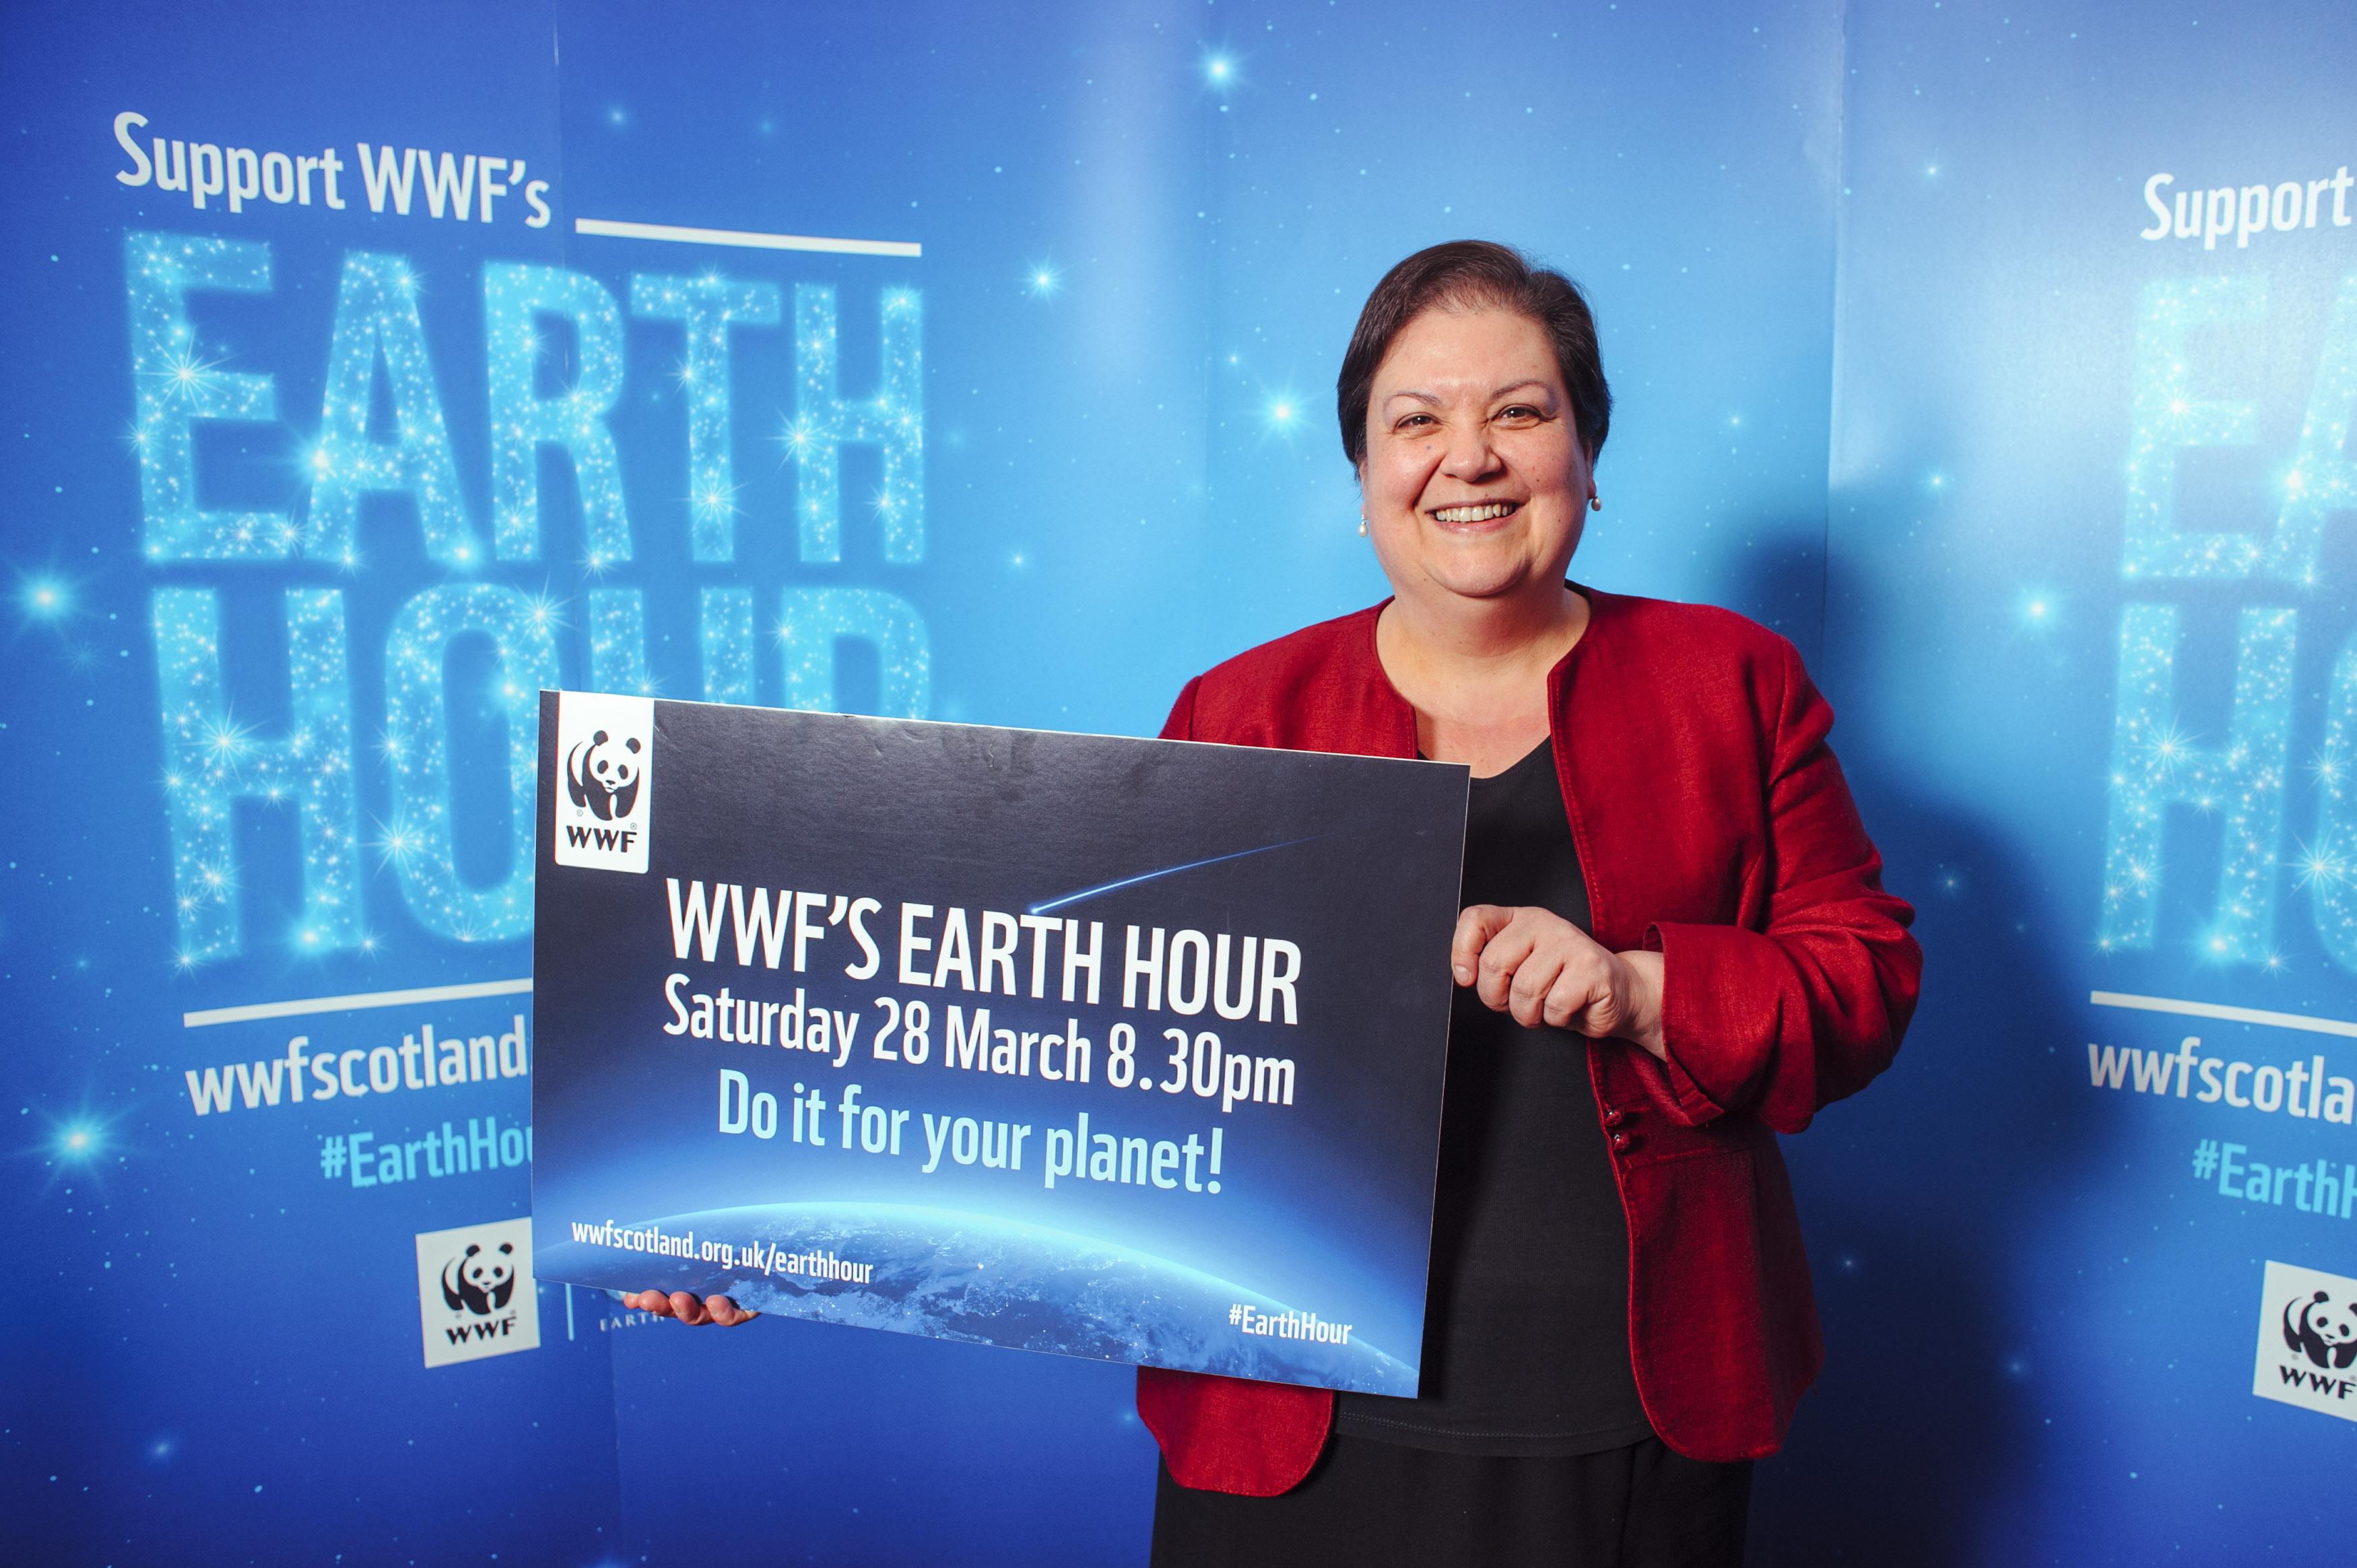 Earth_Hour_2015.jpg